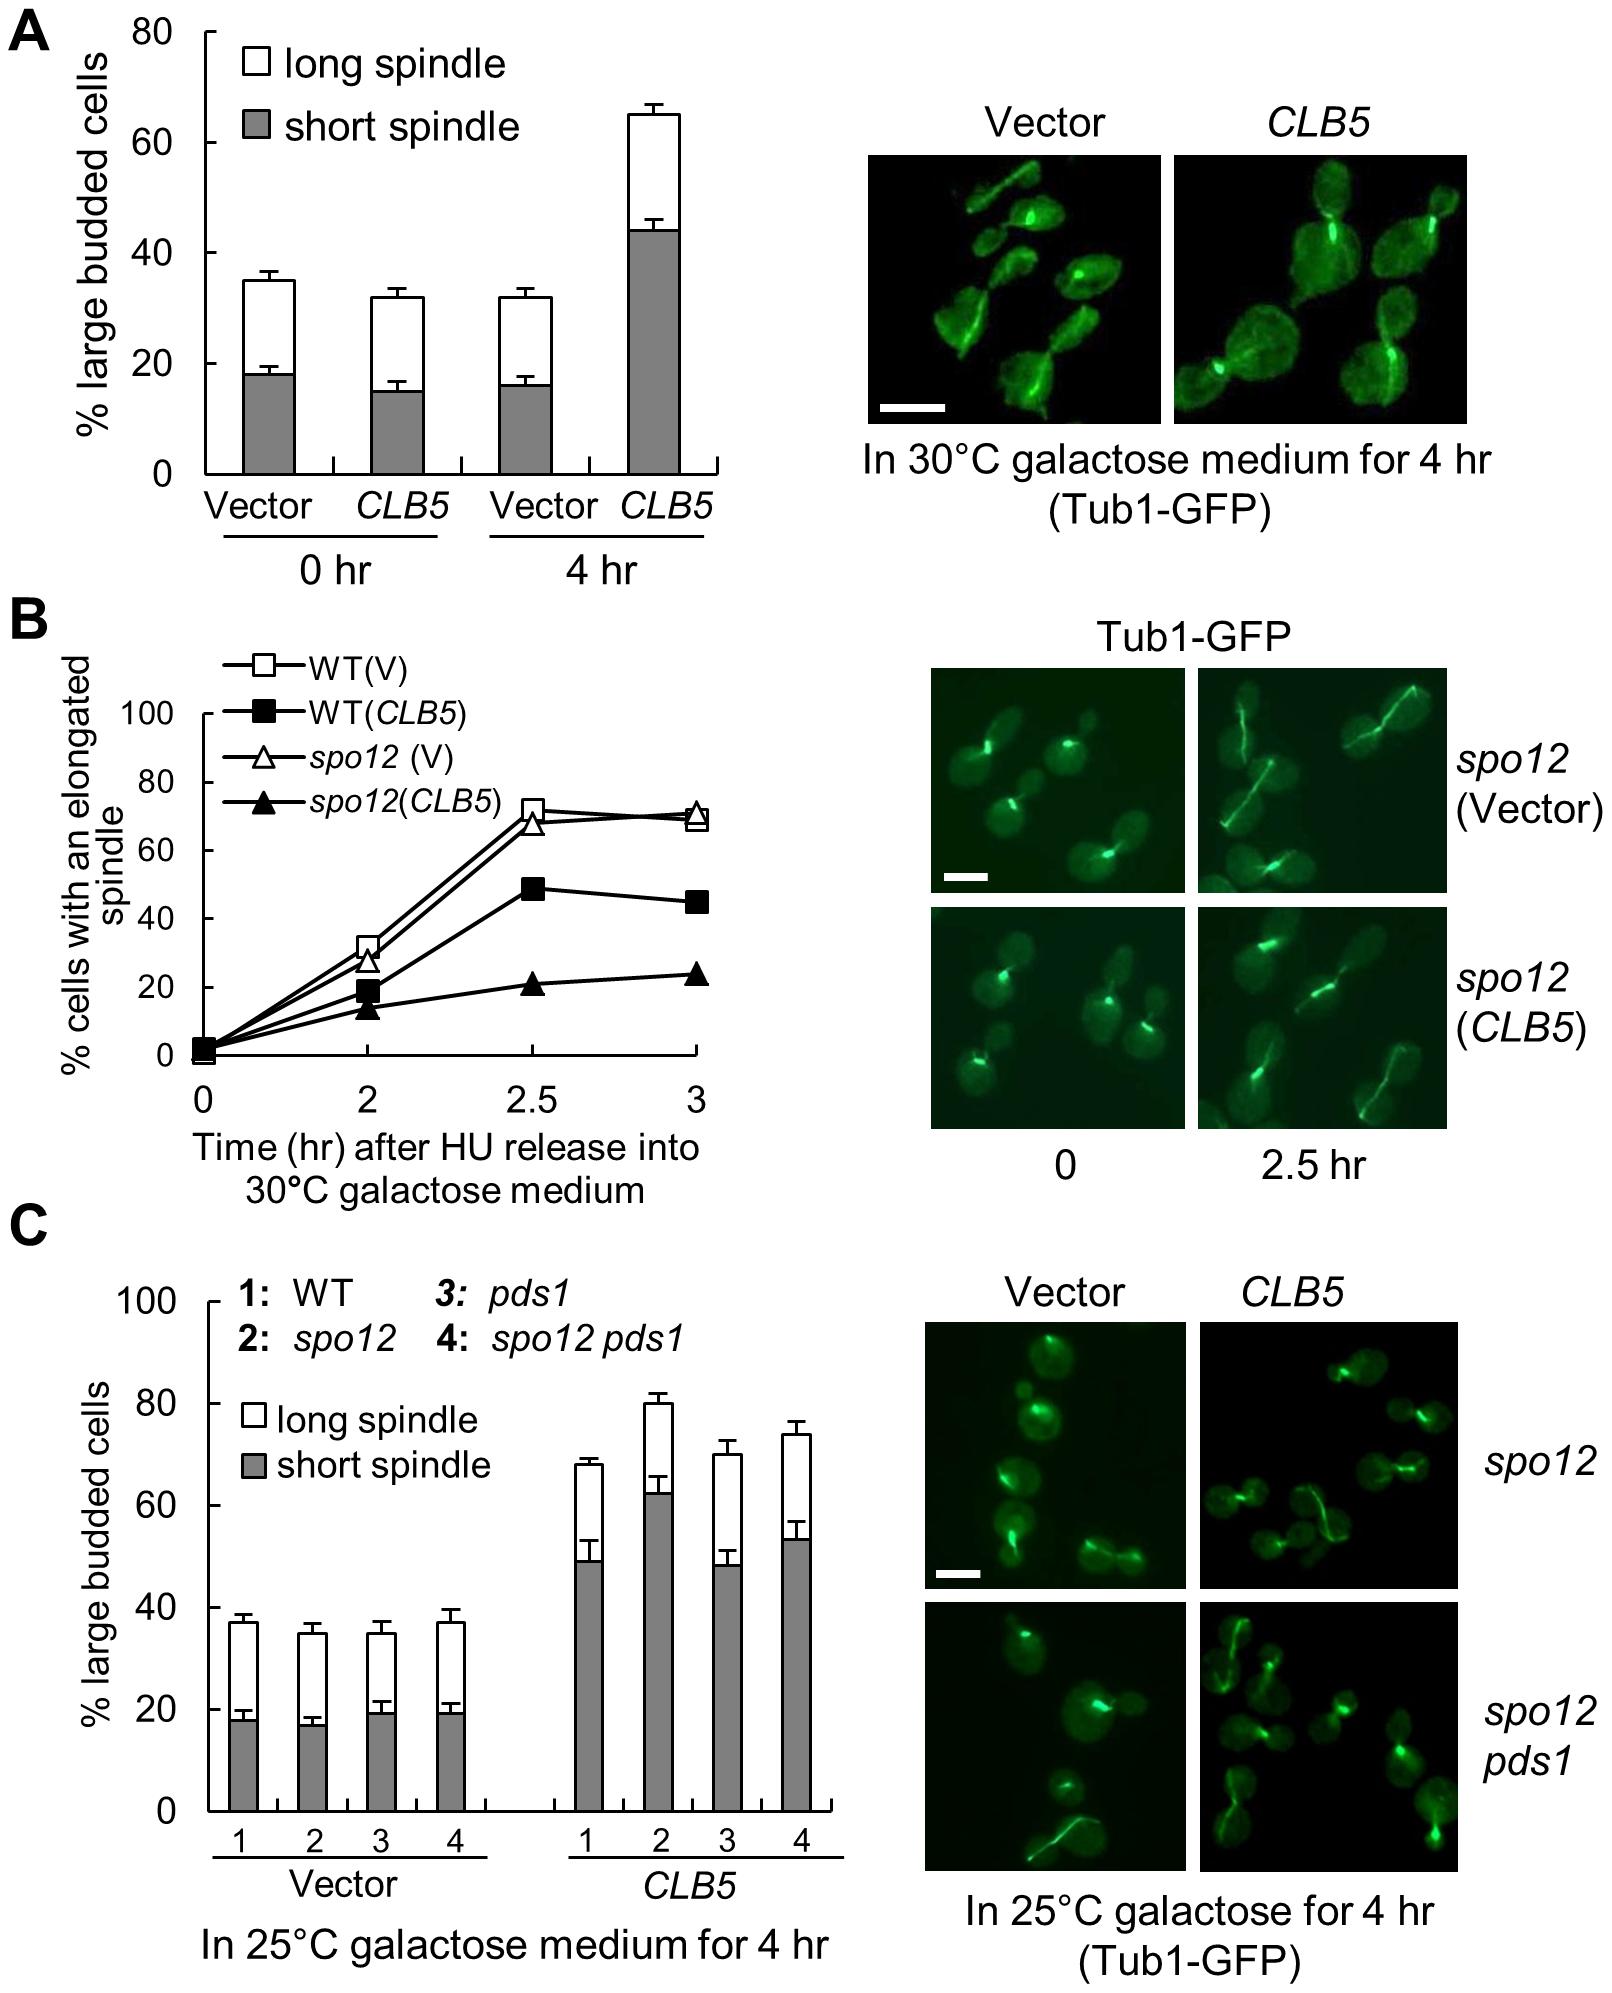 S-phase CDK negatively regulates spindle elongation.